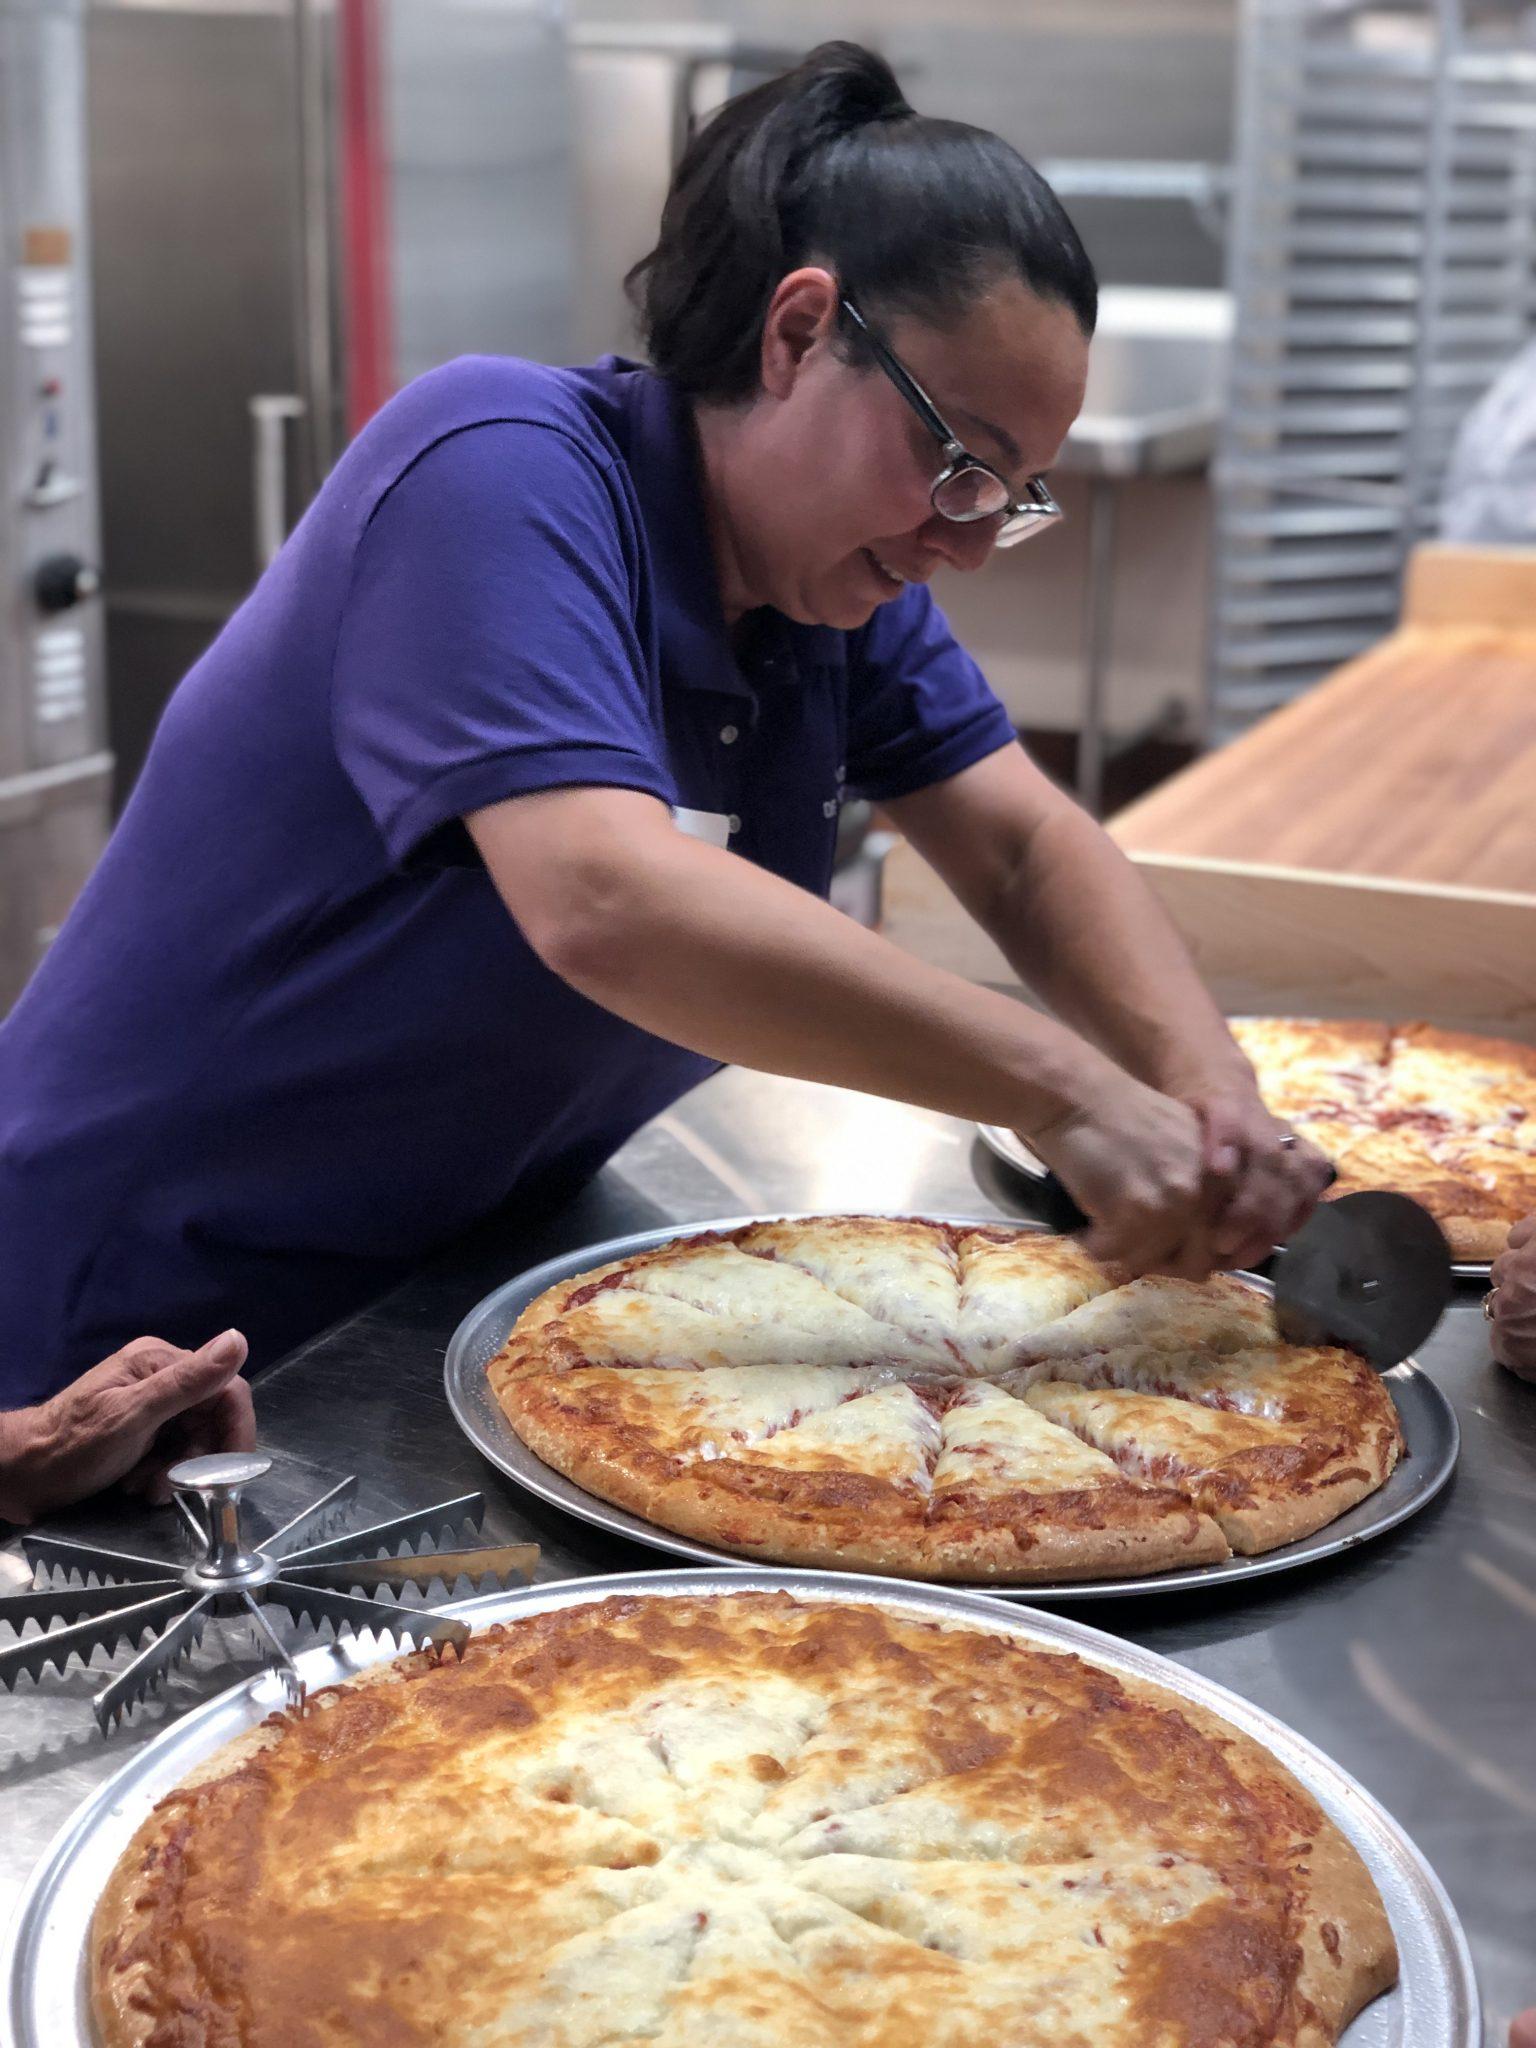 A woman cuts a pizza in a school kitchen.